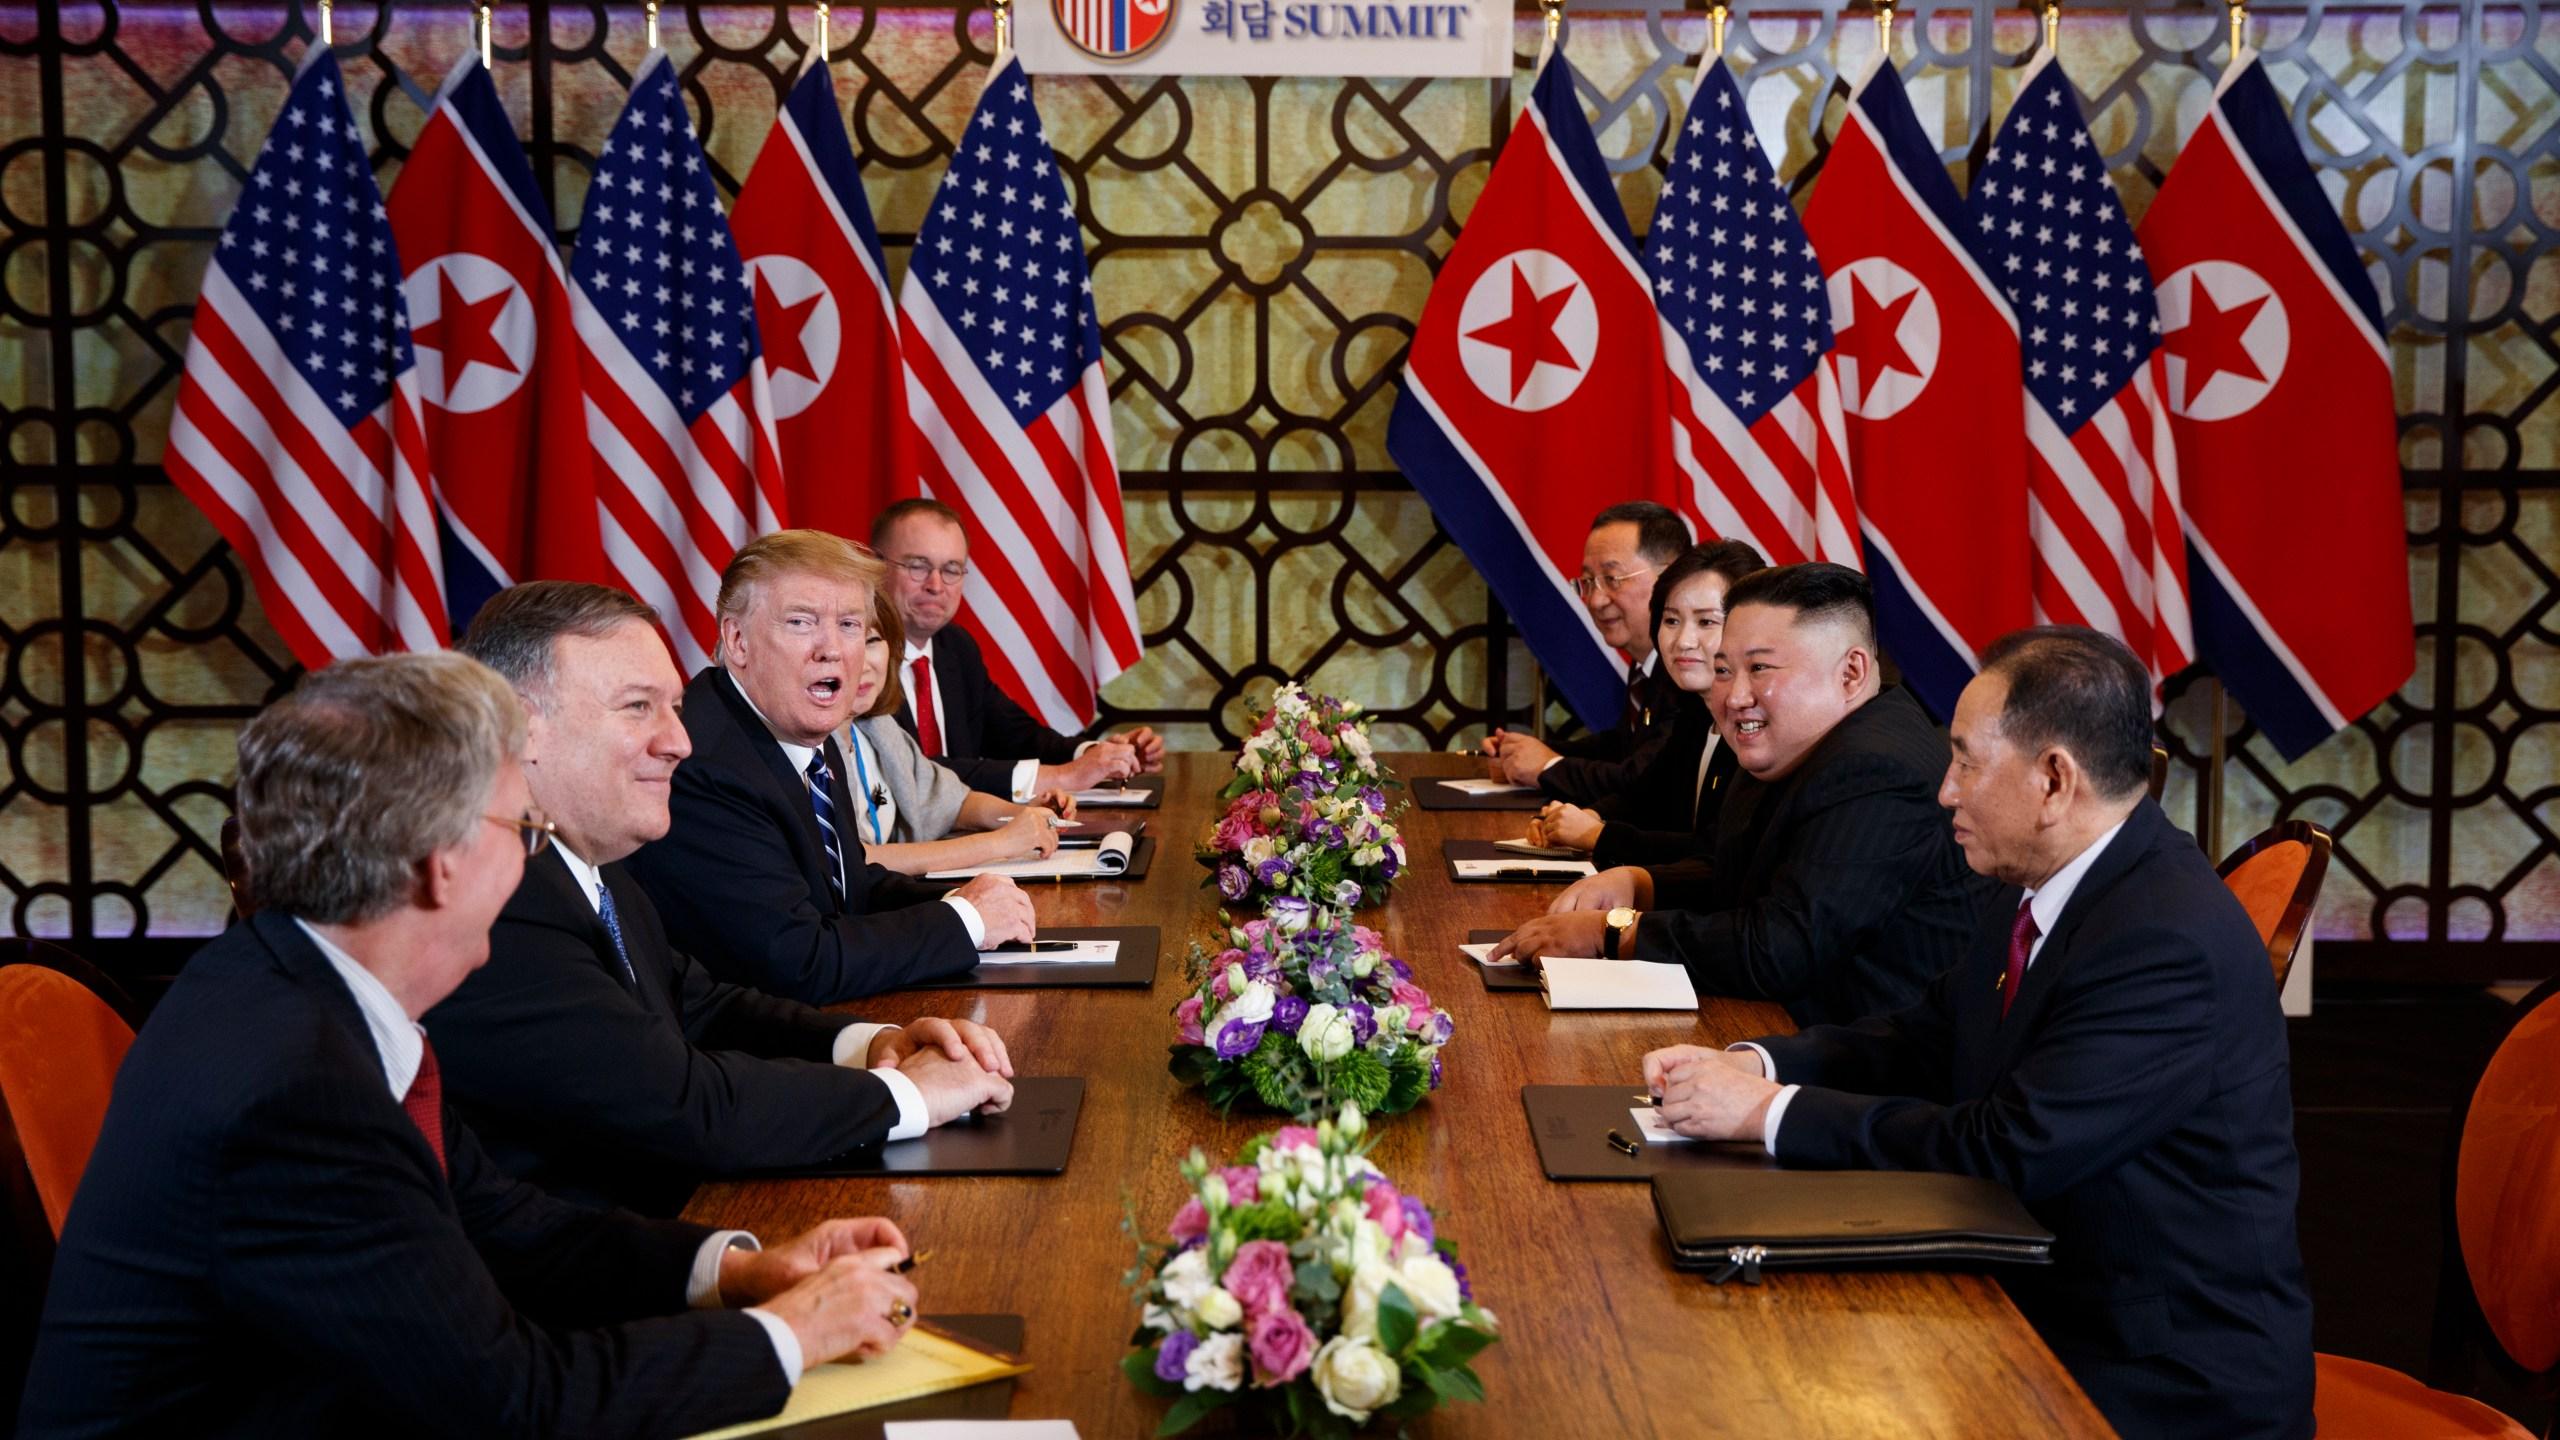 Trump_Kim_Summit_05331-159532.jpg30133725